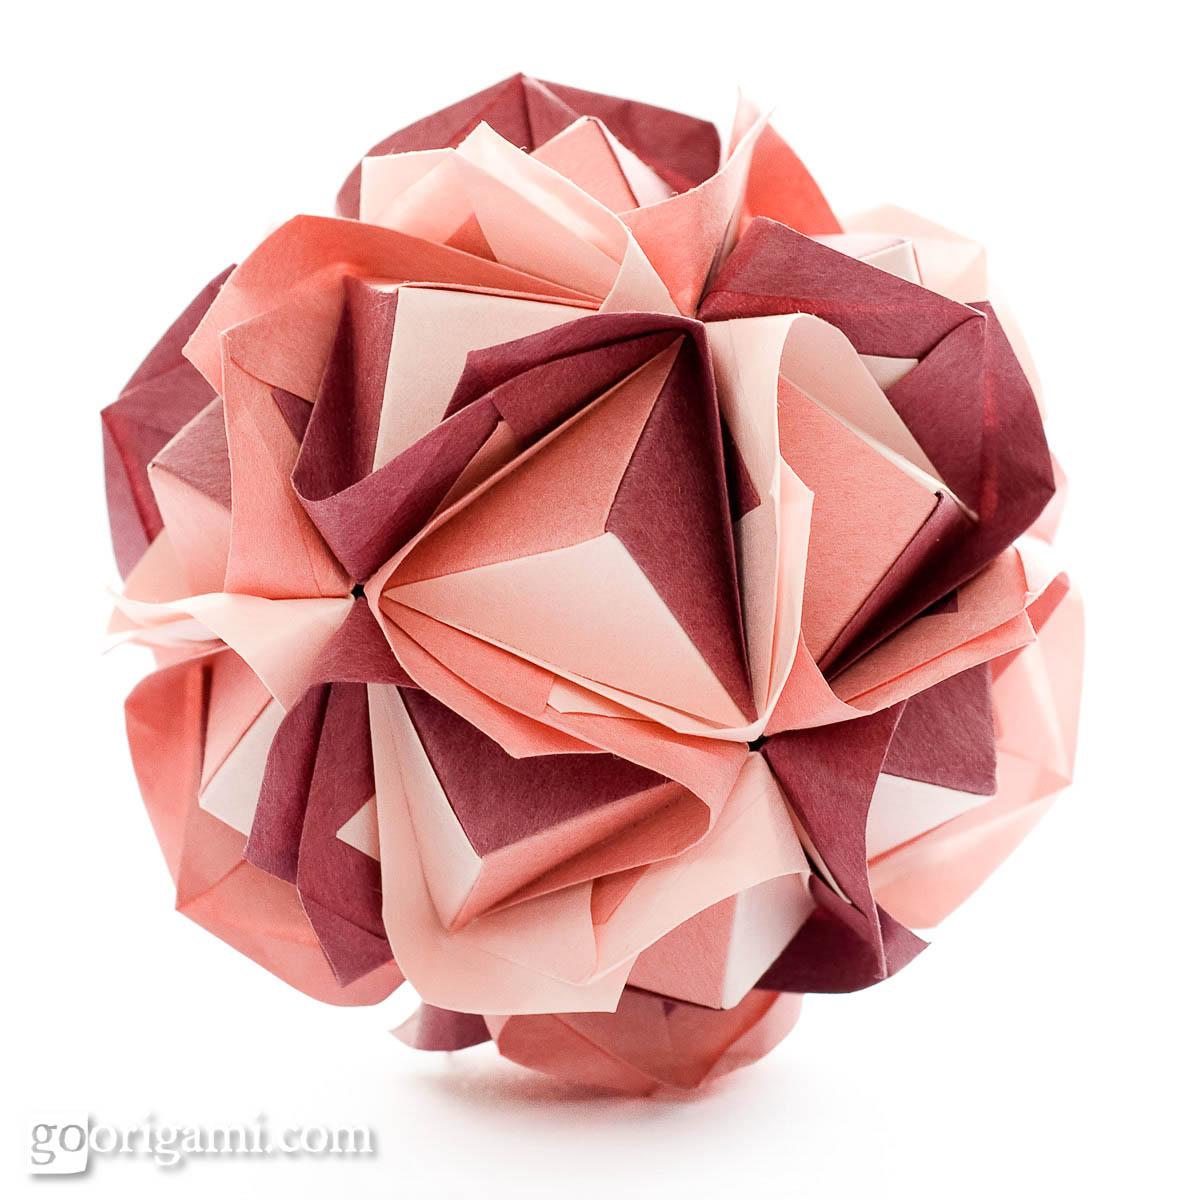 kusudama ball diagram how to wire a transfer switch for generator clover by maria sinayskaya  go origami